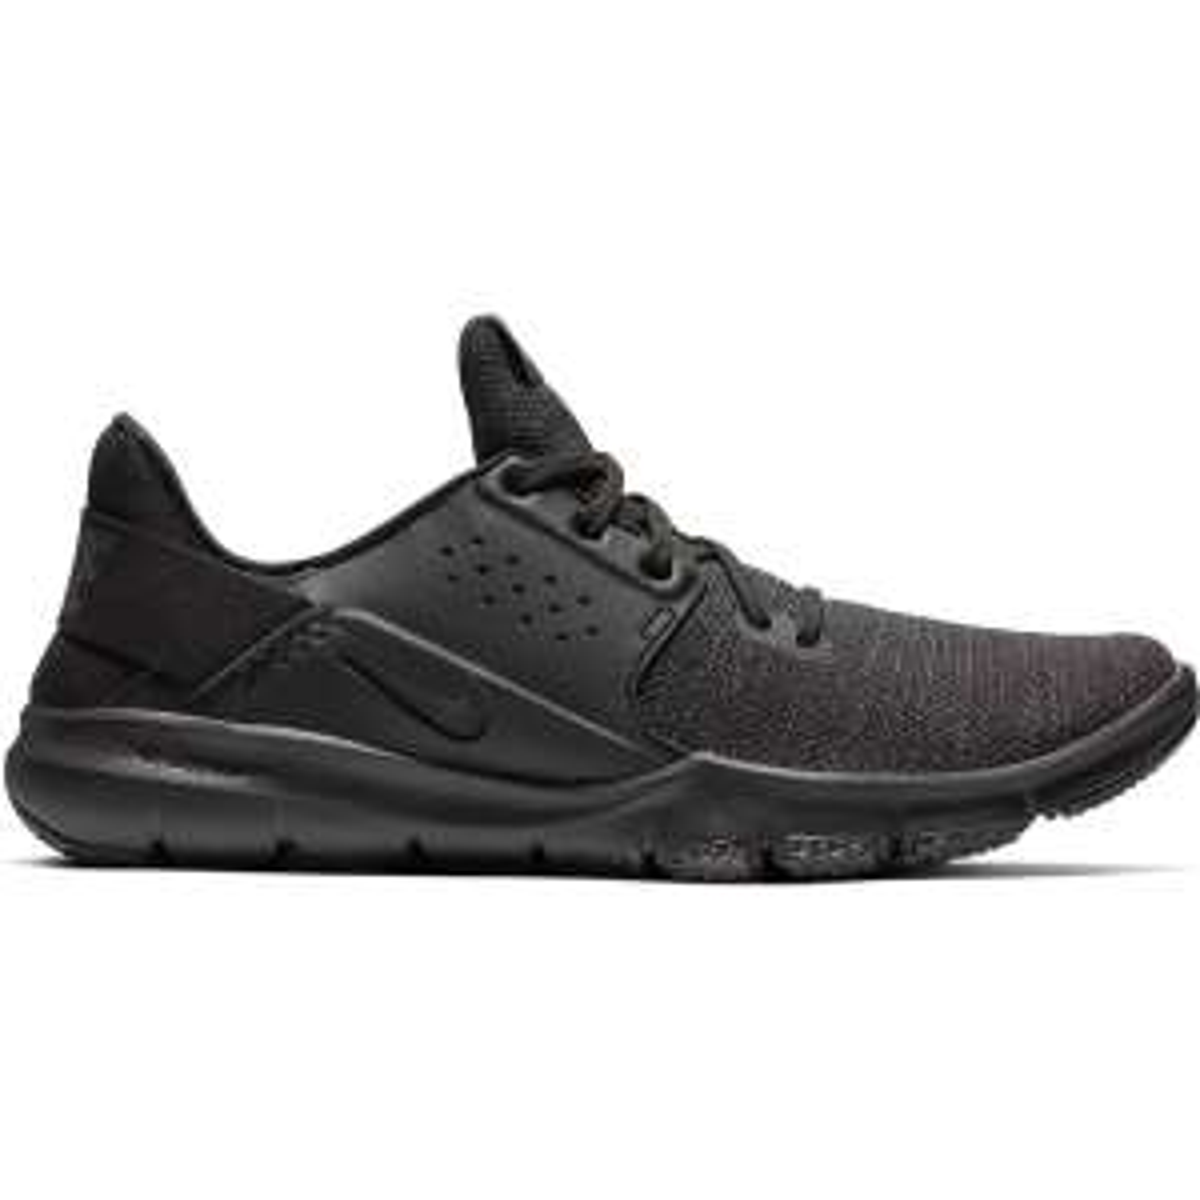 Nike Herren Trainingsschuh/Sneaker Flex Control 3 + kostenloser Versand